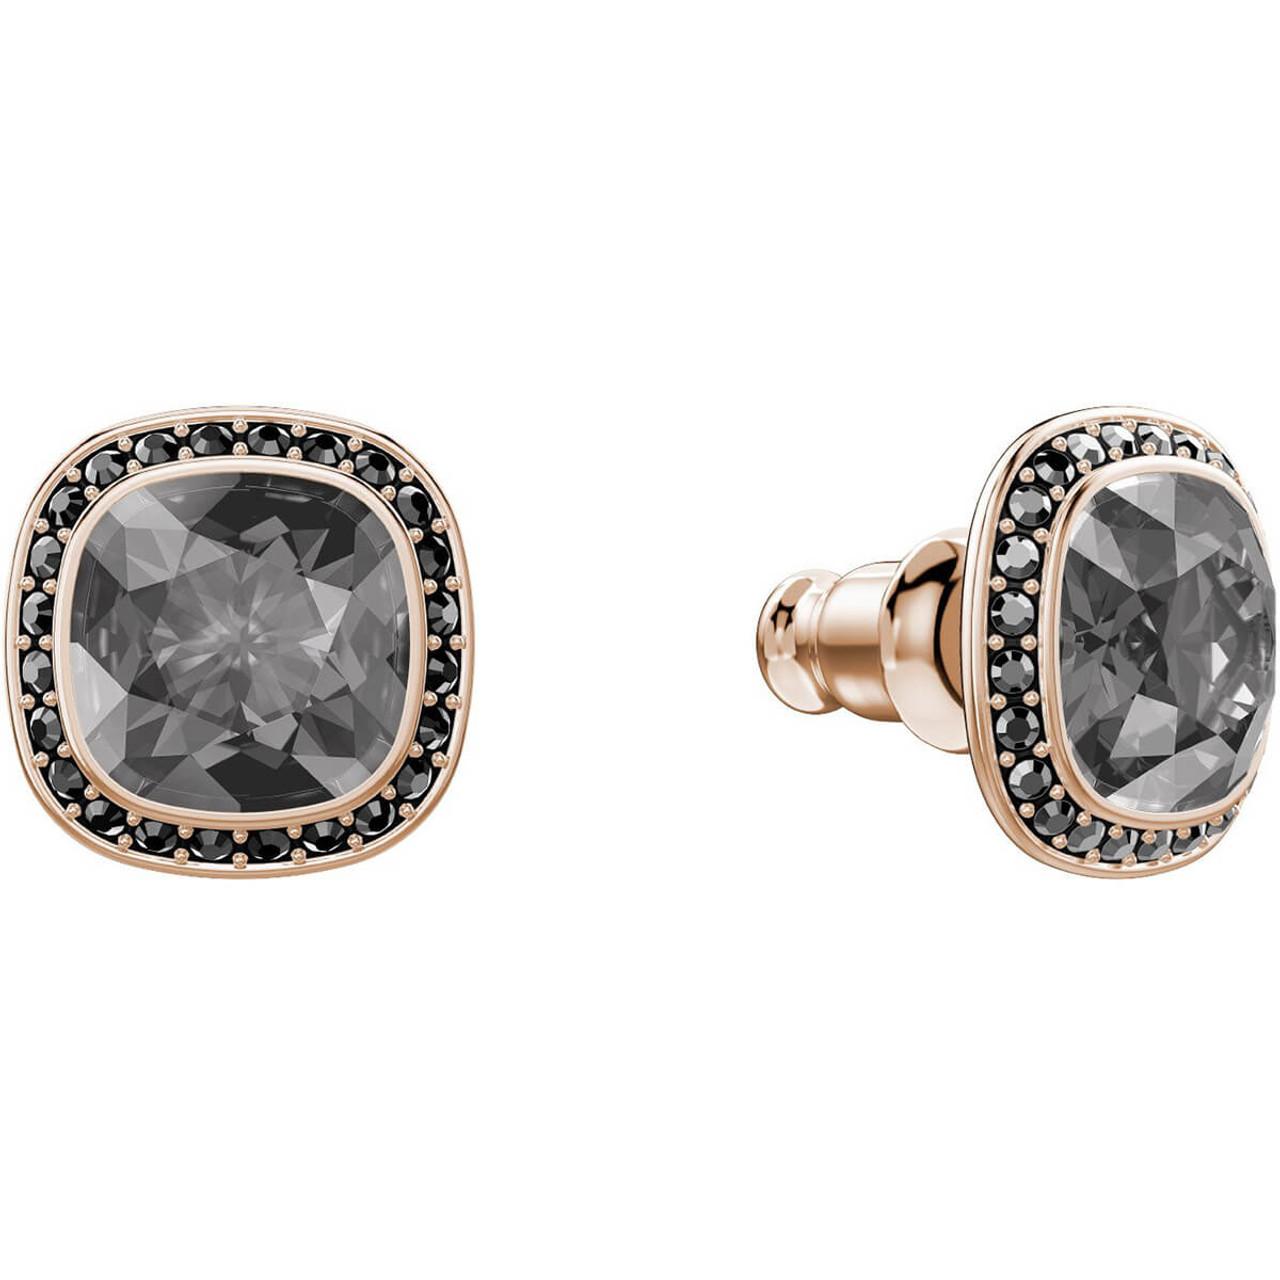 de945e8bc swarovski-latitude-black-crystal-rose-gold-stud-earrings -5430357__45600.1547132809.jpg?c=2&imbypass=on